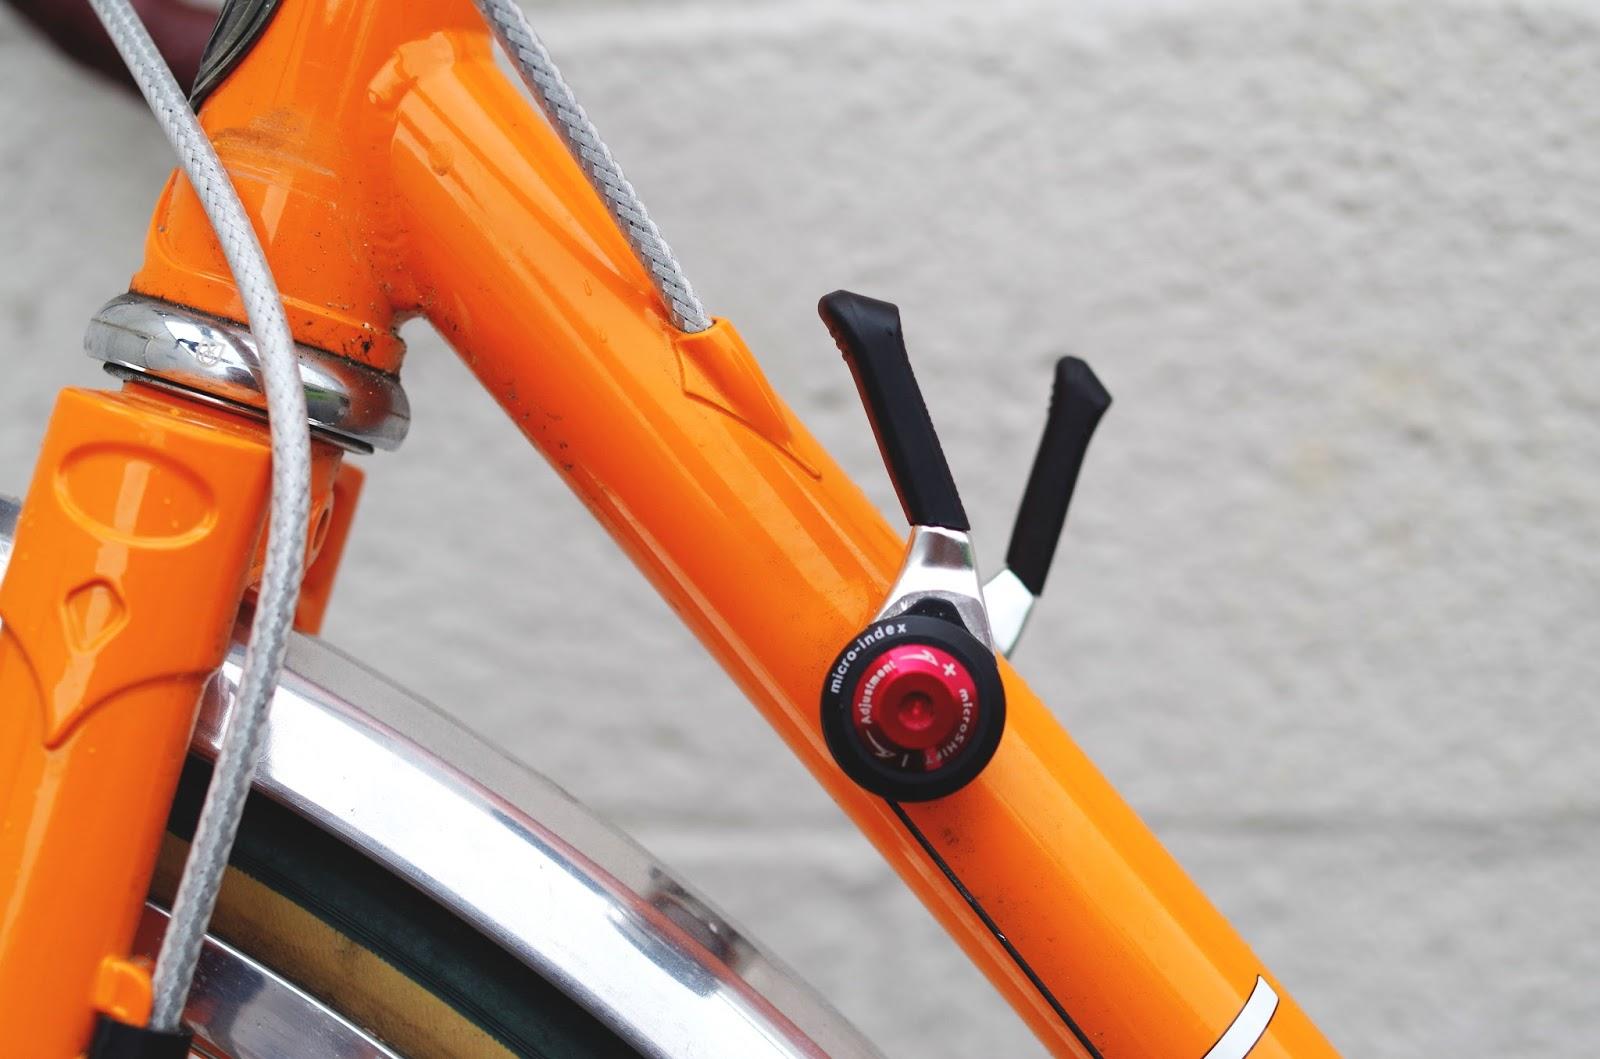 Shimano Sis Derailleur Cable /& Housing Kit Bike Mountain // Orange